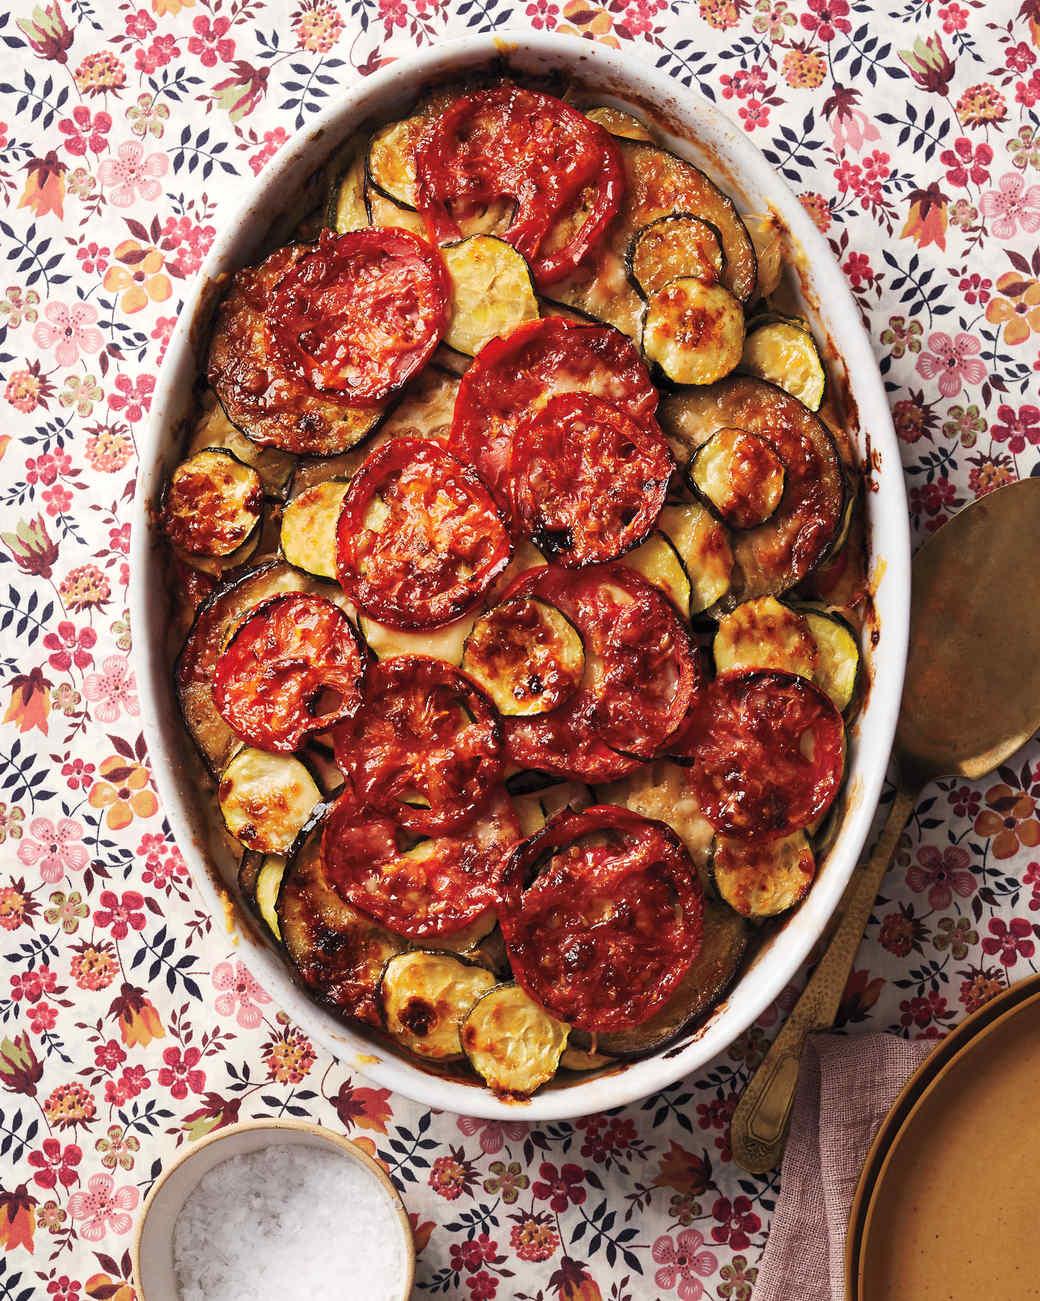 zucchini-tomato-casserole-opener-047-d112407.jpg